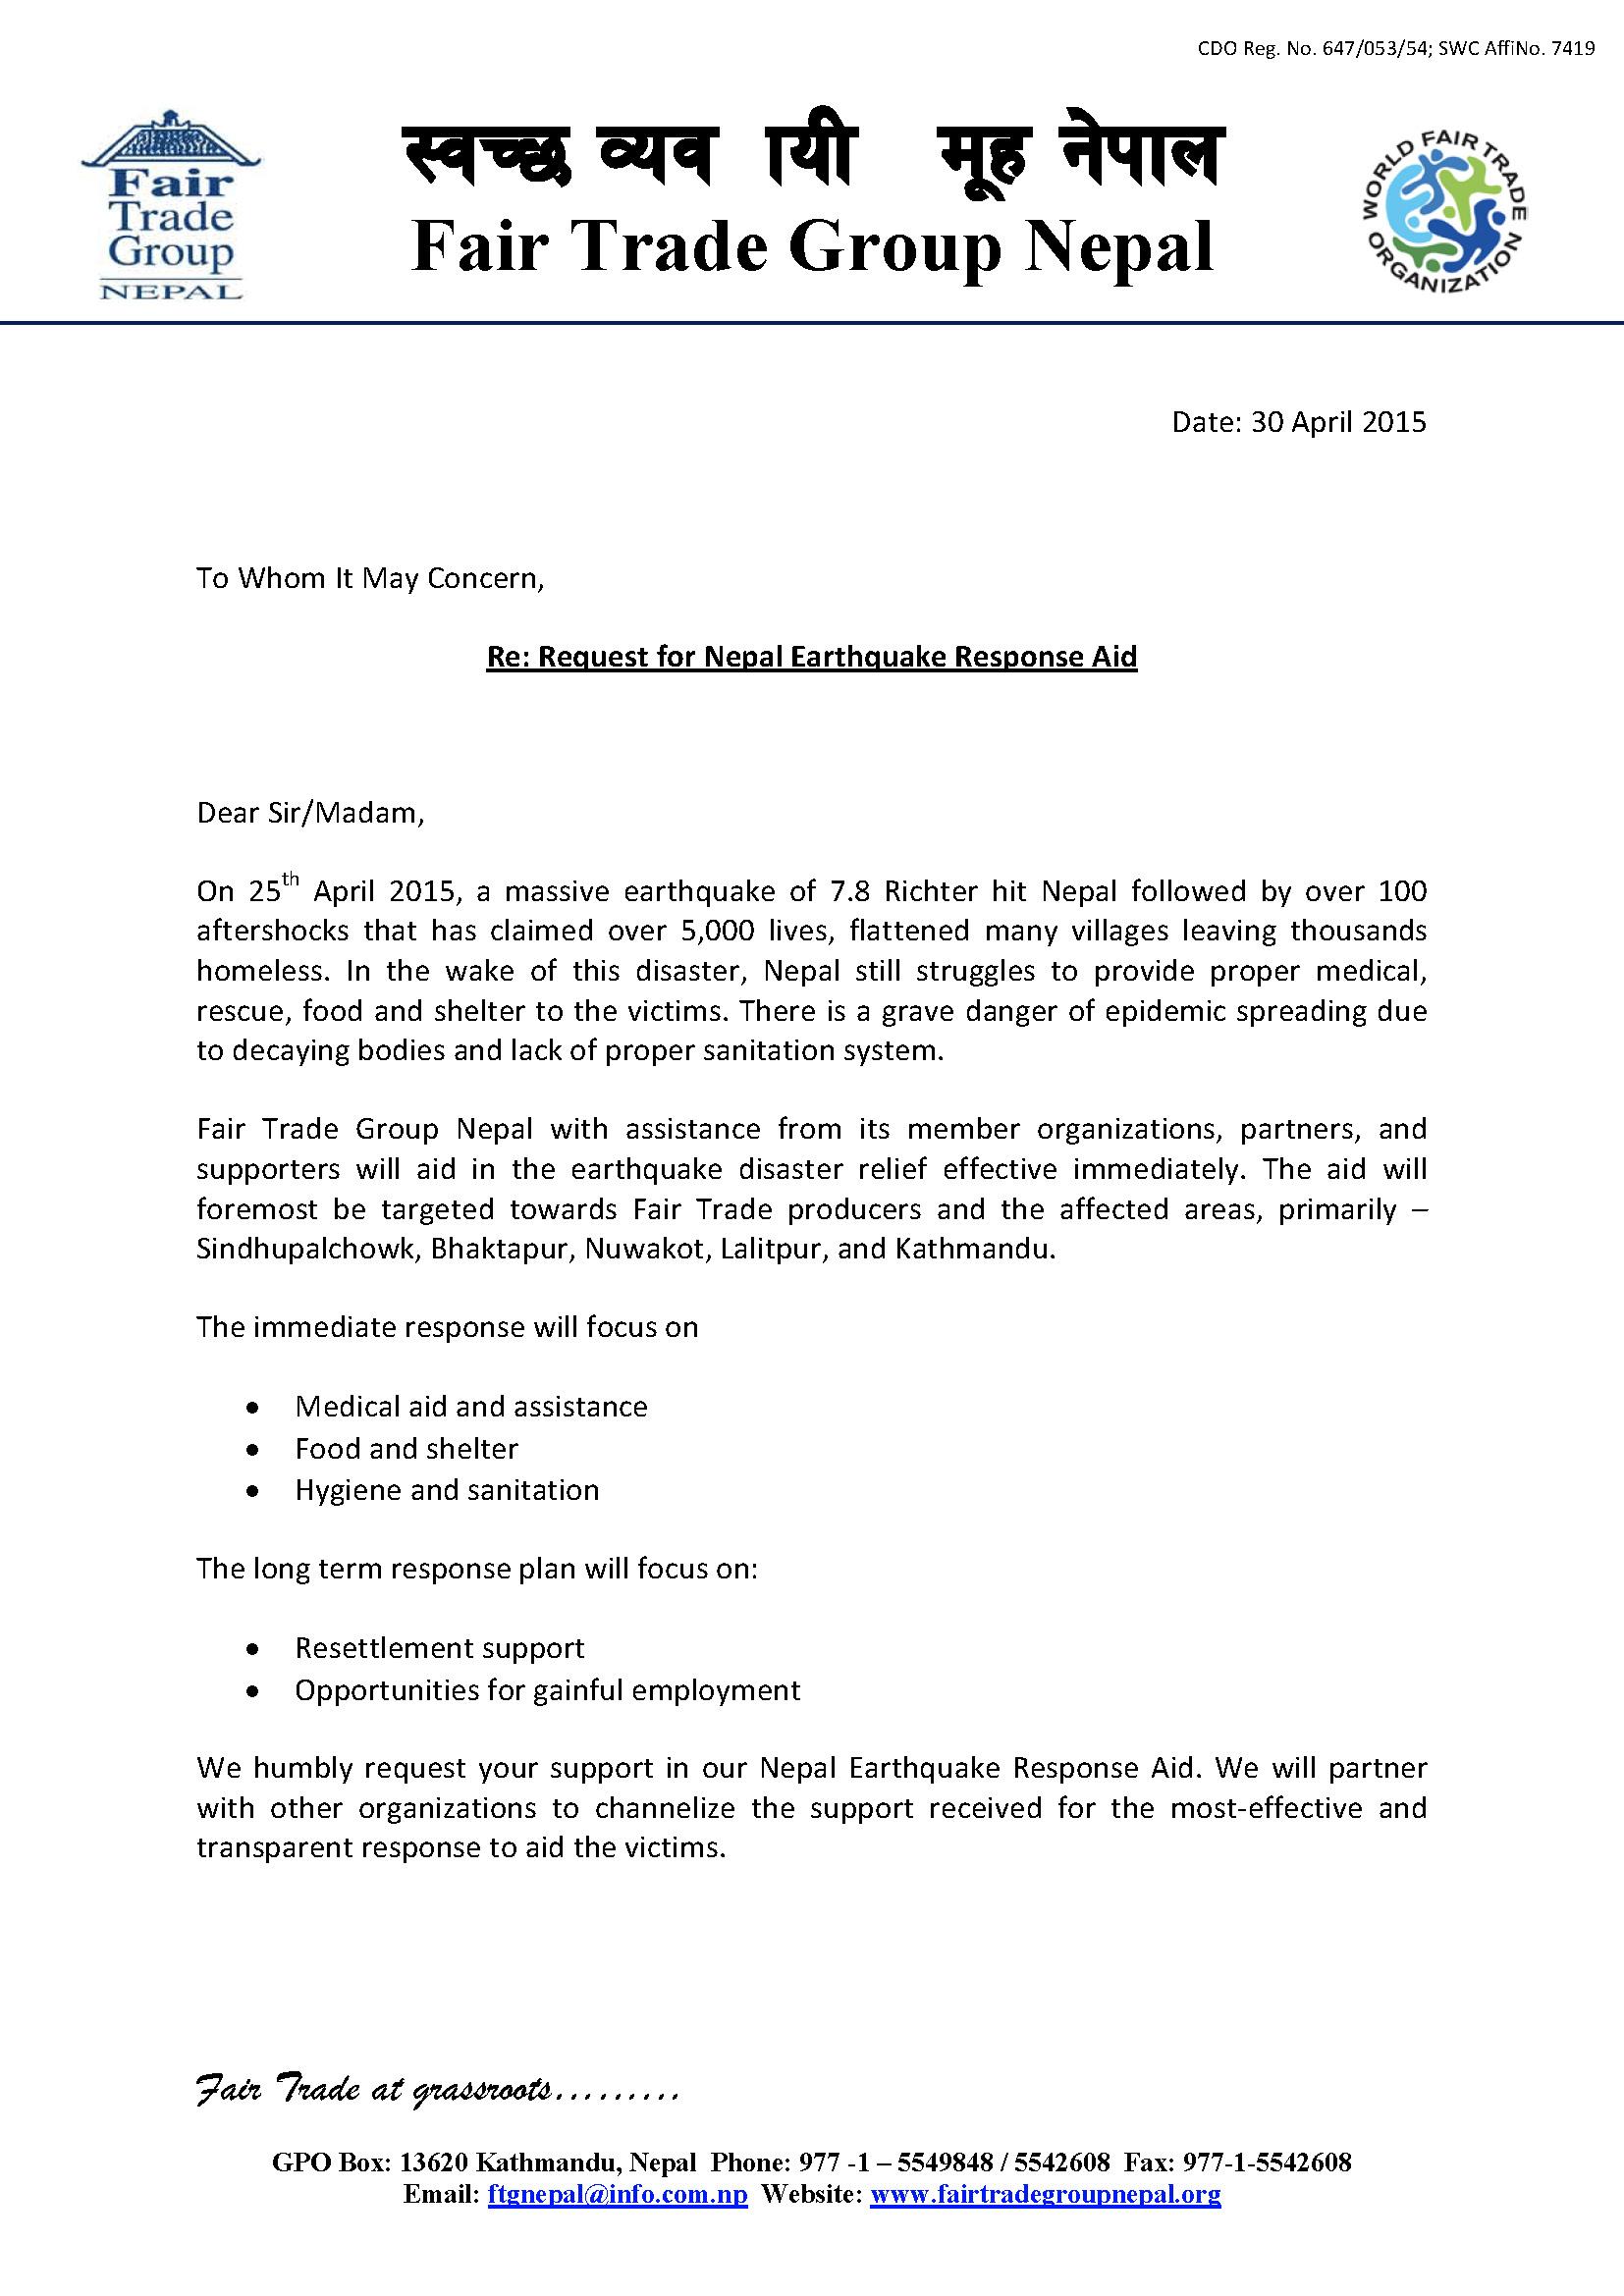 FTGN-Earthquake-Response-Aid_Page_1.jpg